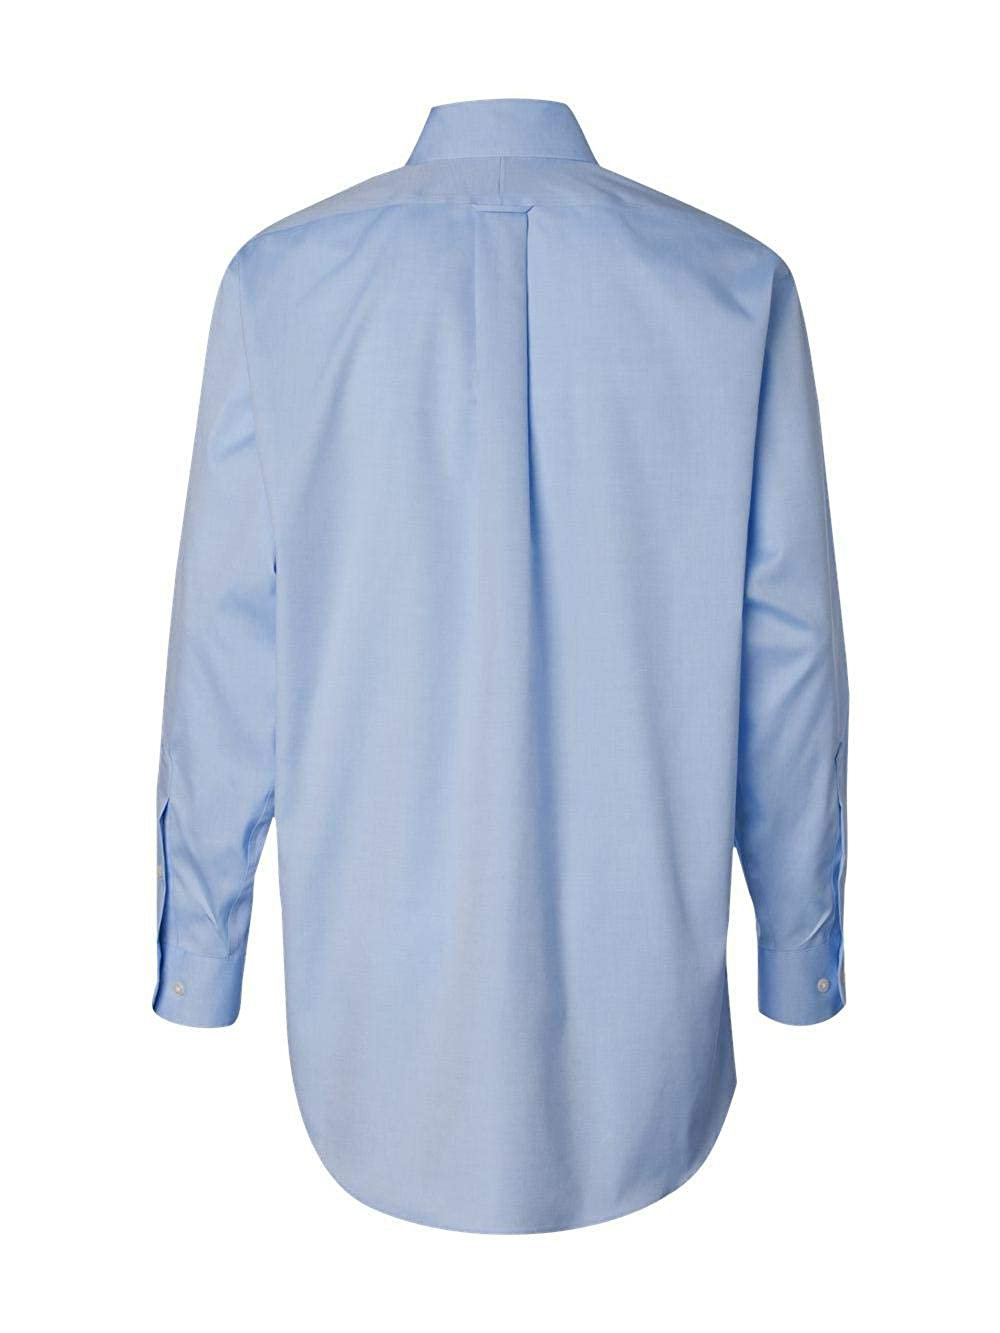 Van Heusen Mens 100 Cotton Non Iron Button Down Dress Shirt